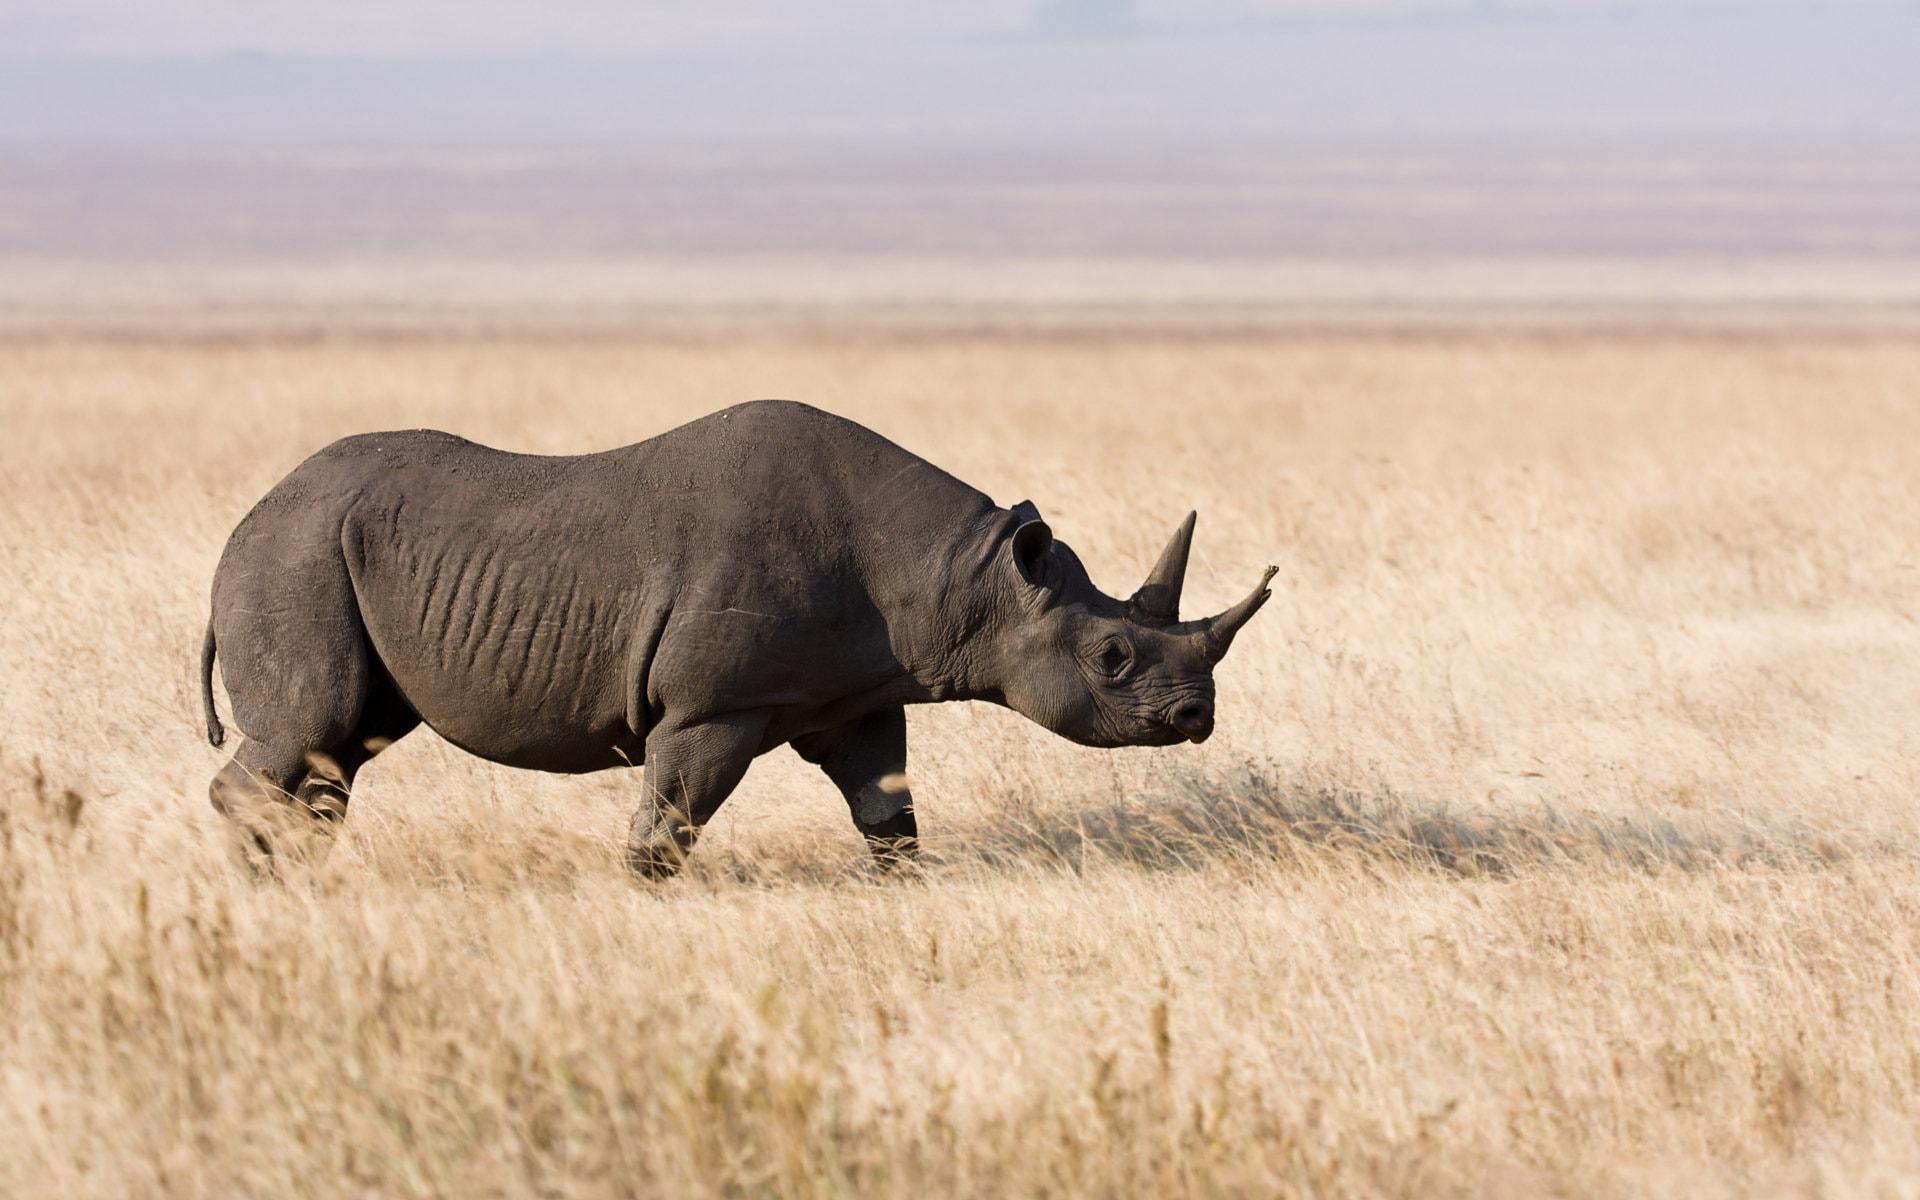 Rhinoceros HD pics